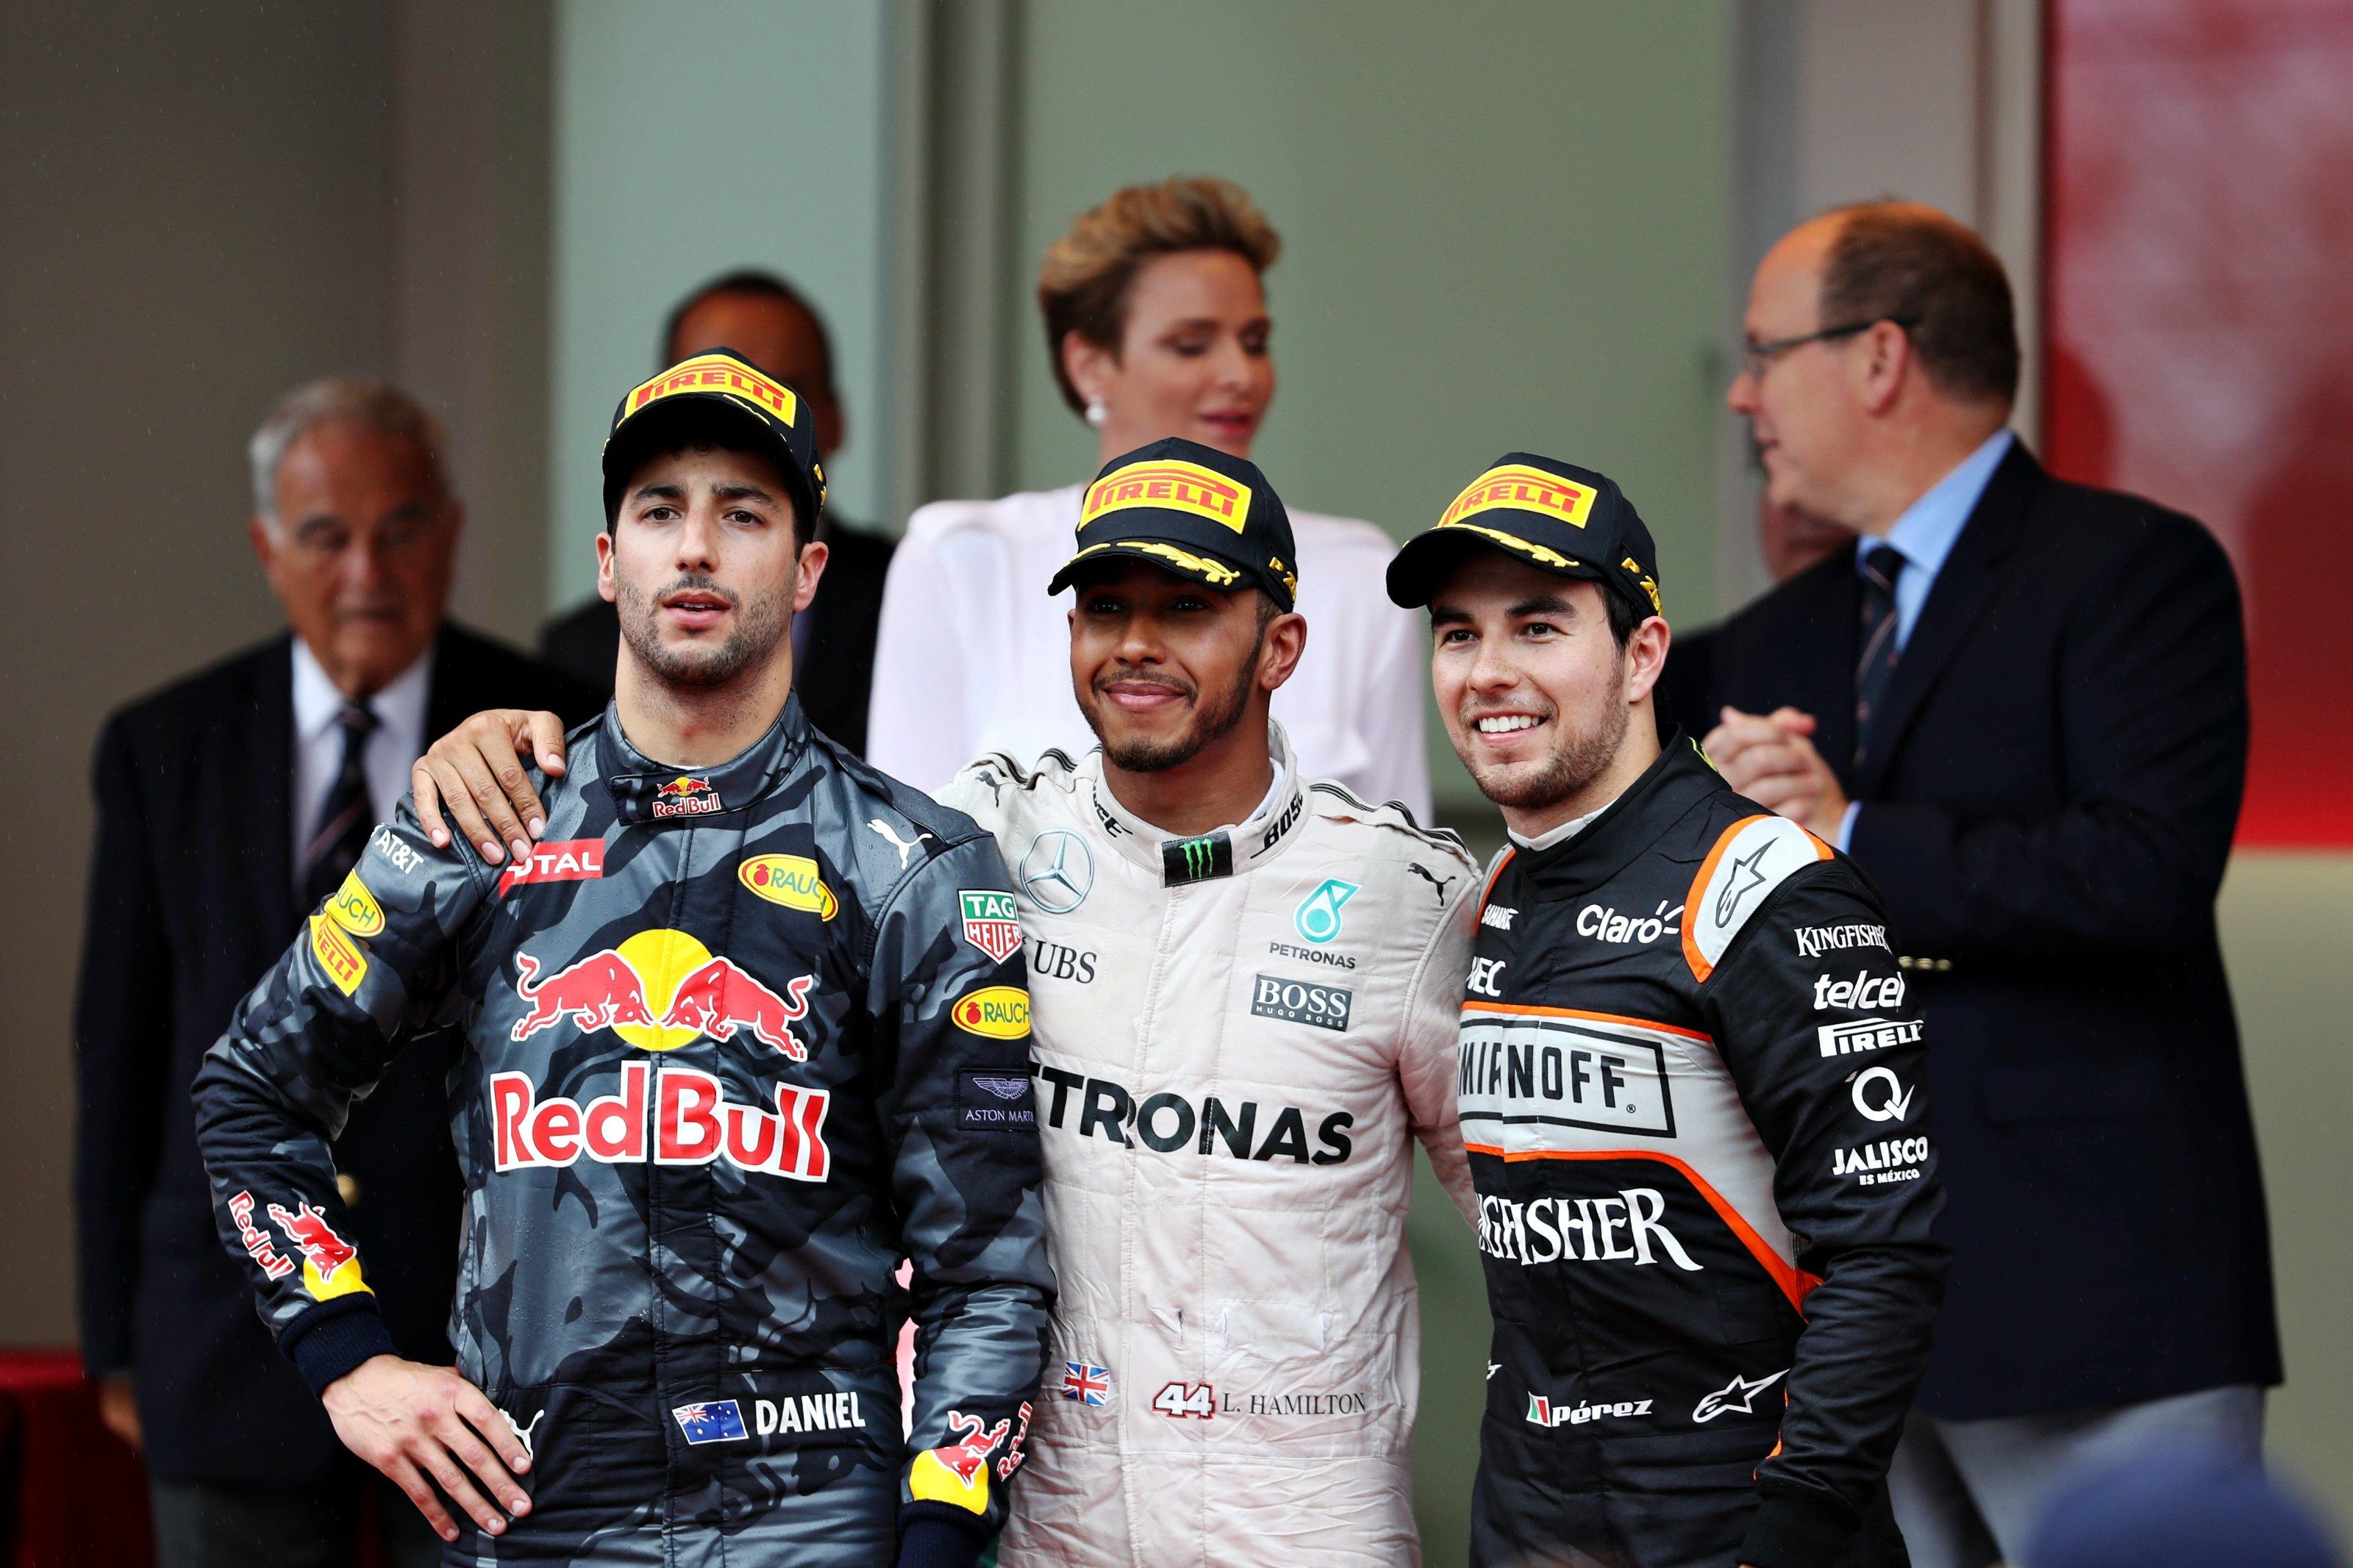 2016 Monaco Grand Prix Podium